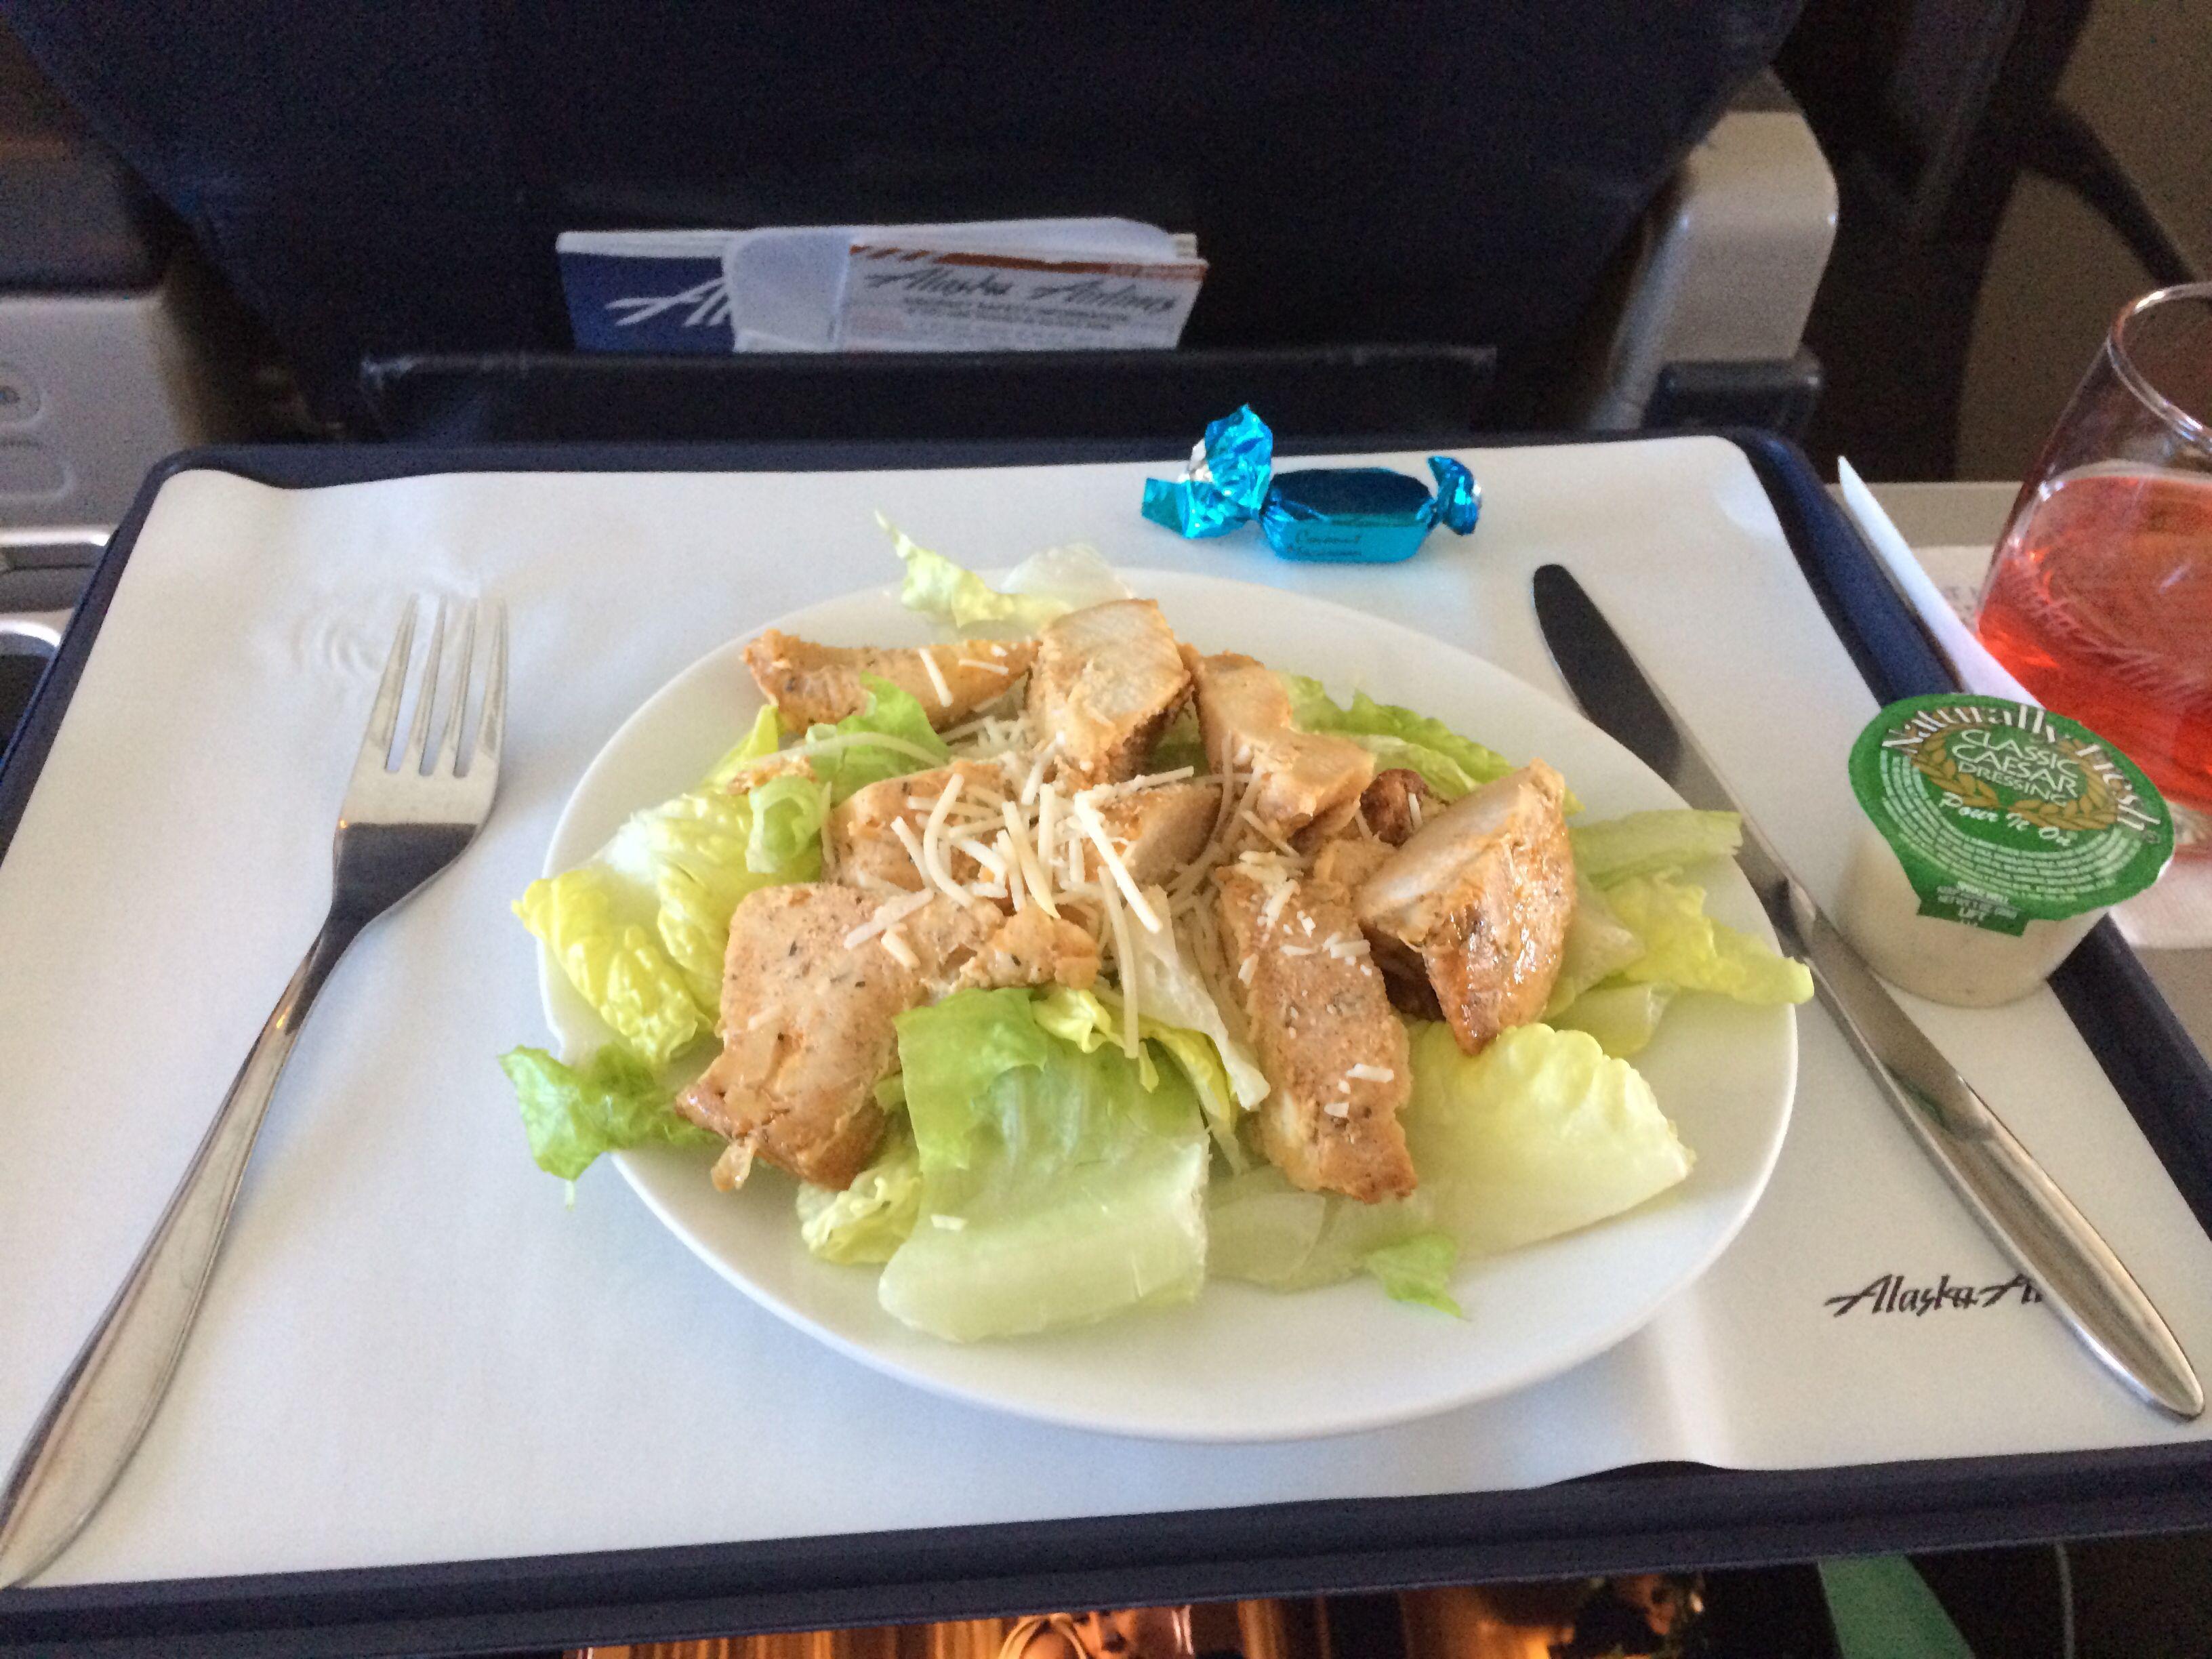 Alaska Airlines Burbank Seattle First Class Meal 737 700